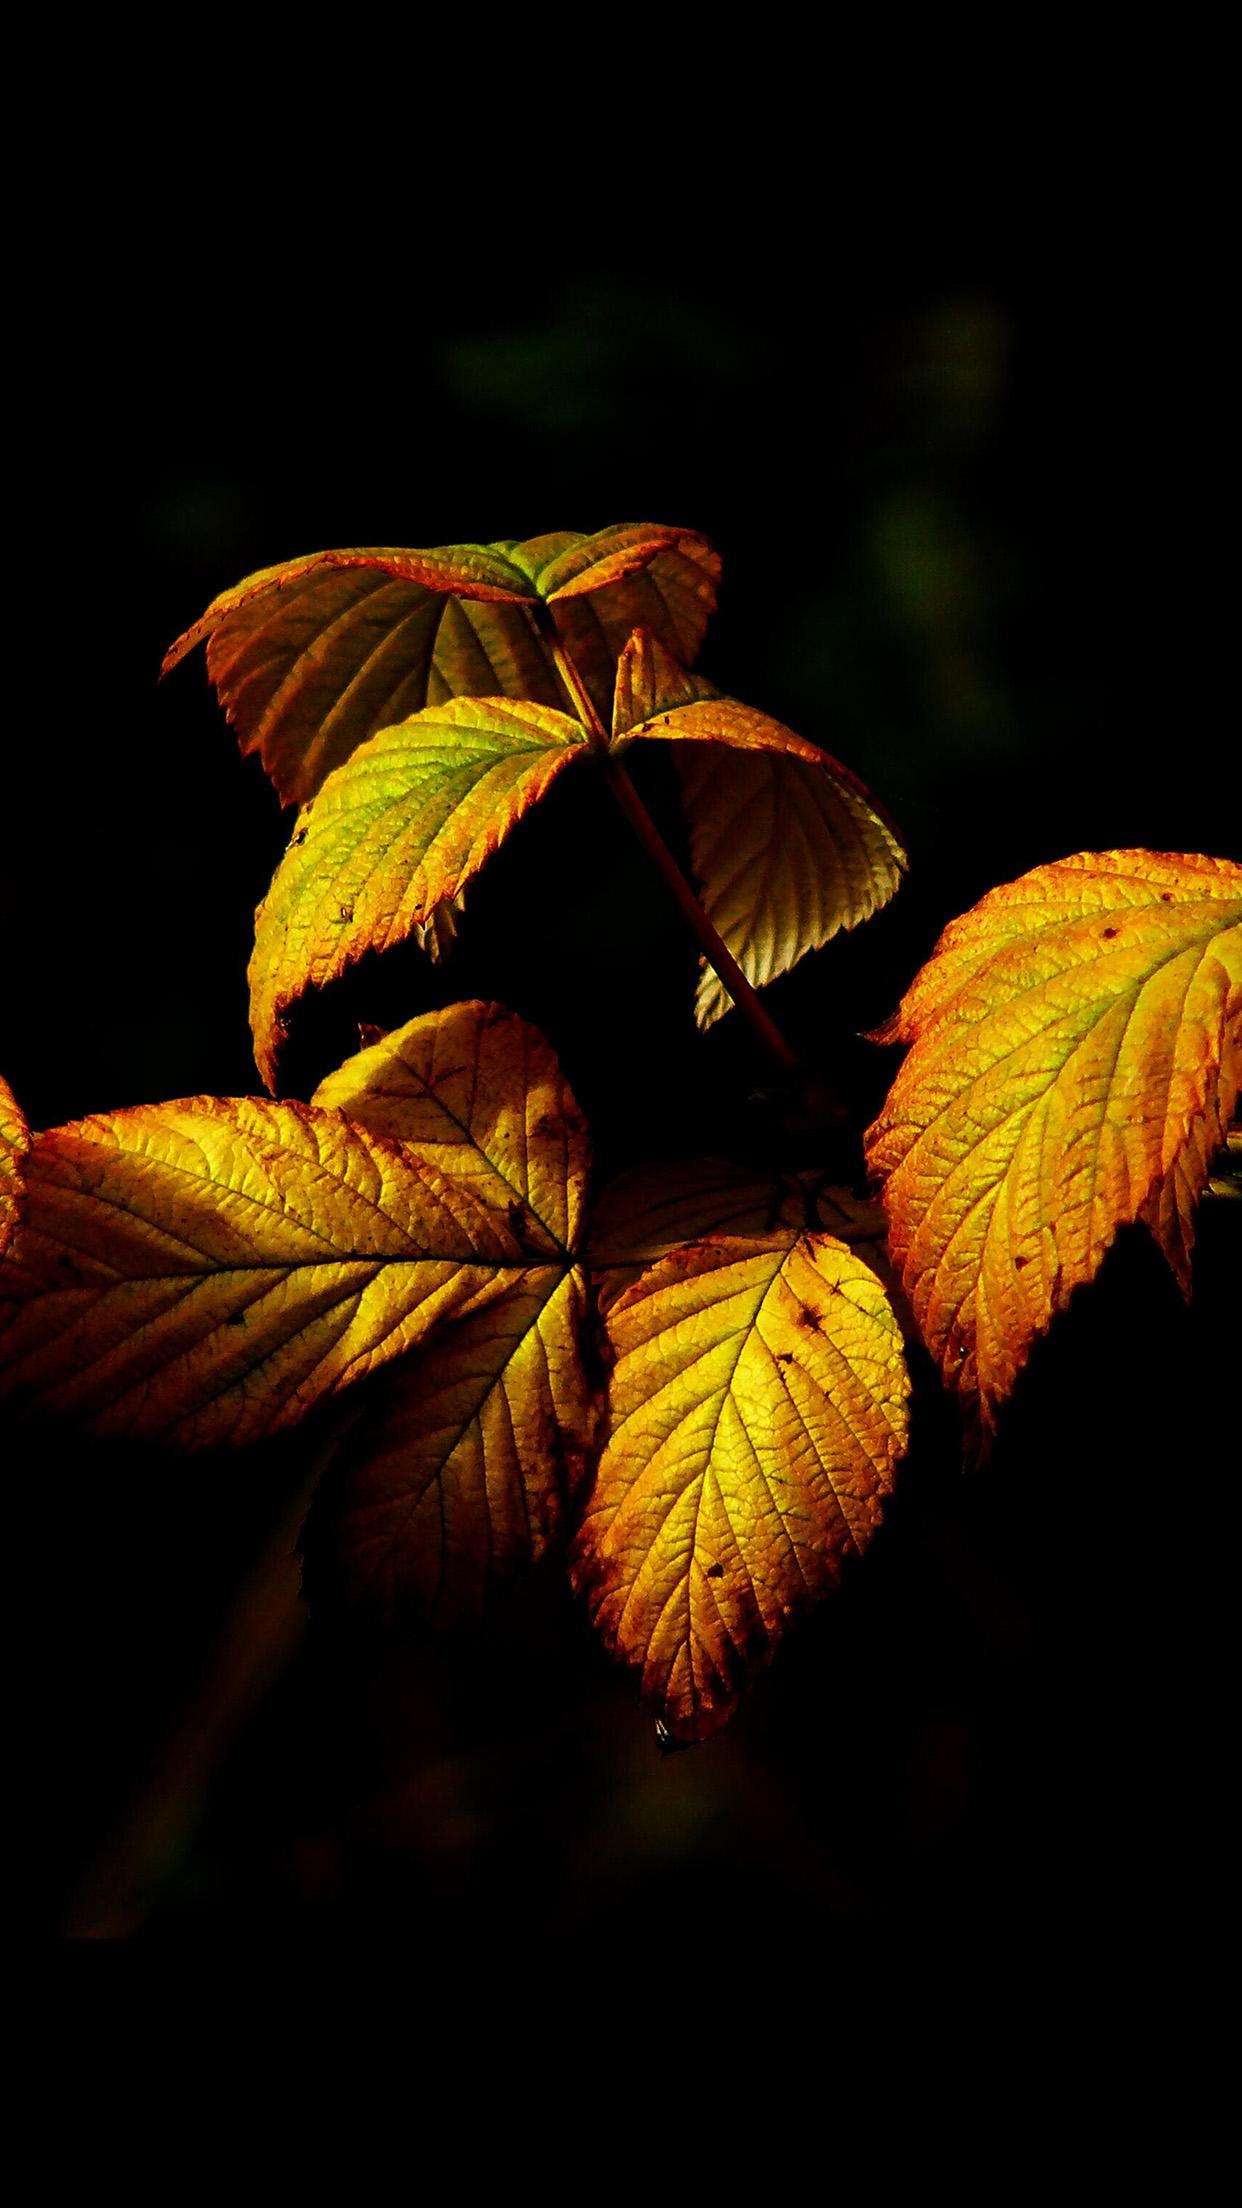 Fall Wallpaper For Ipad Air 2 No32 Fall Leaf Dark Nature